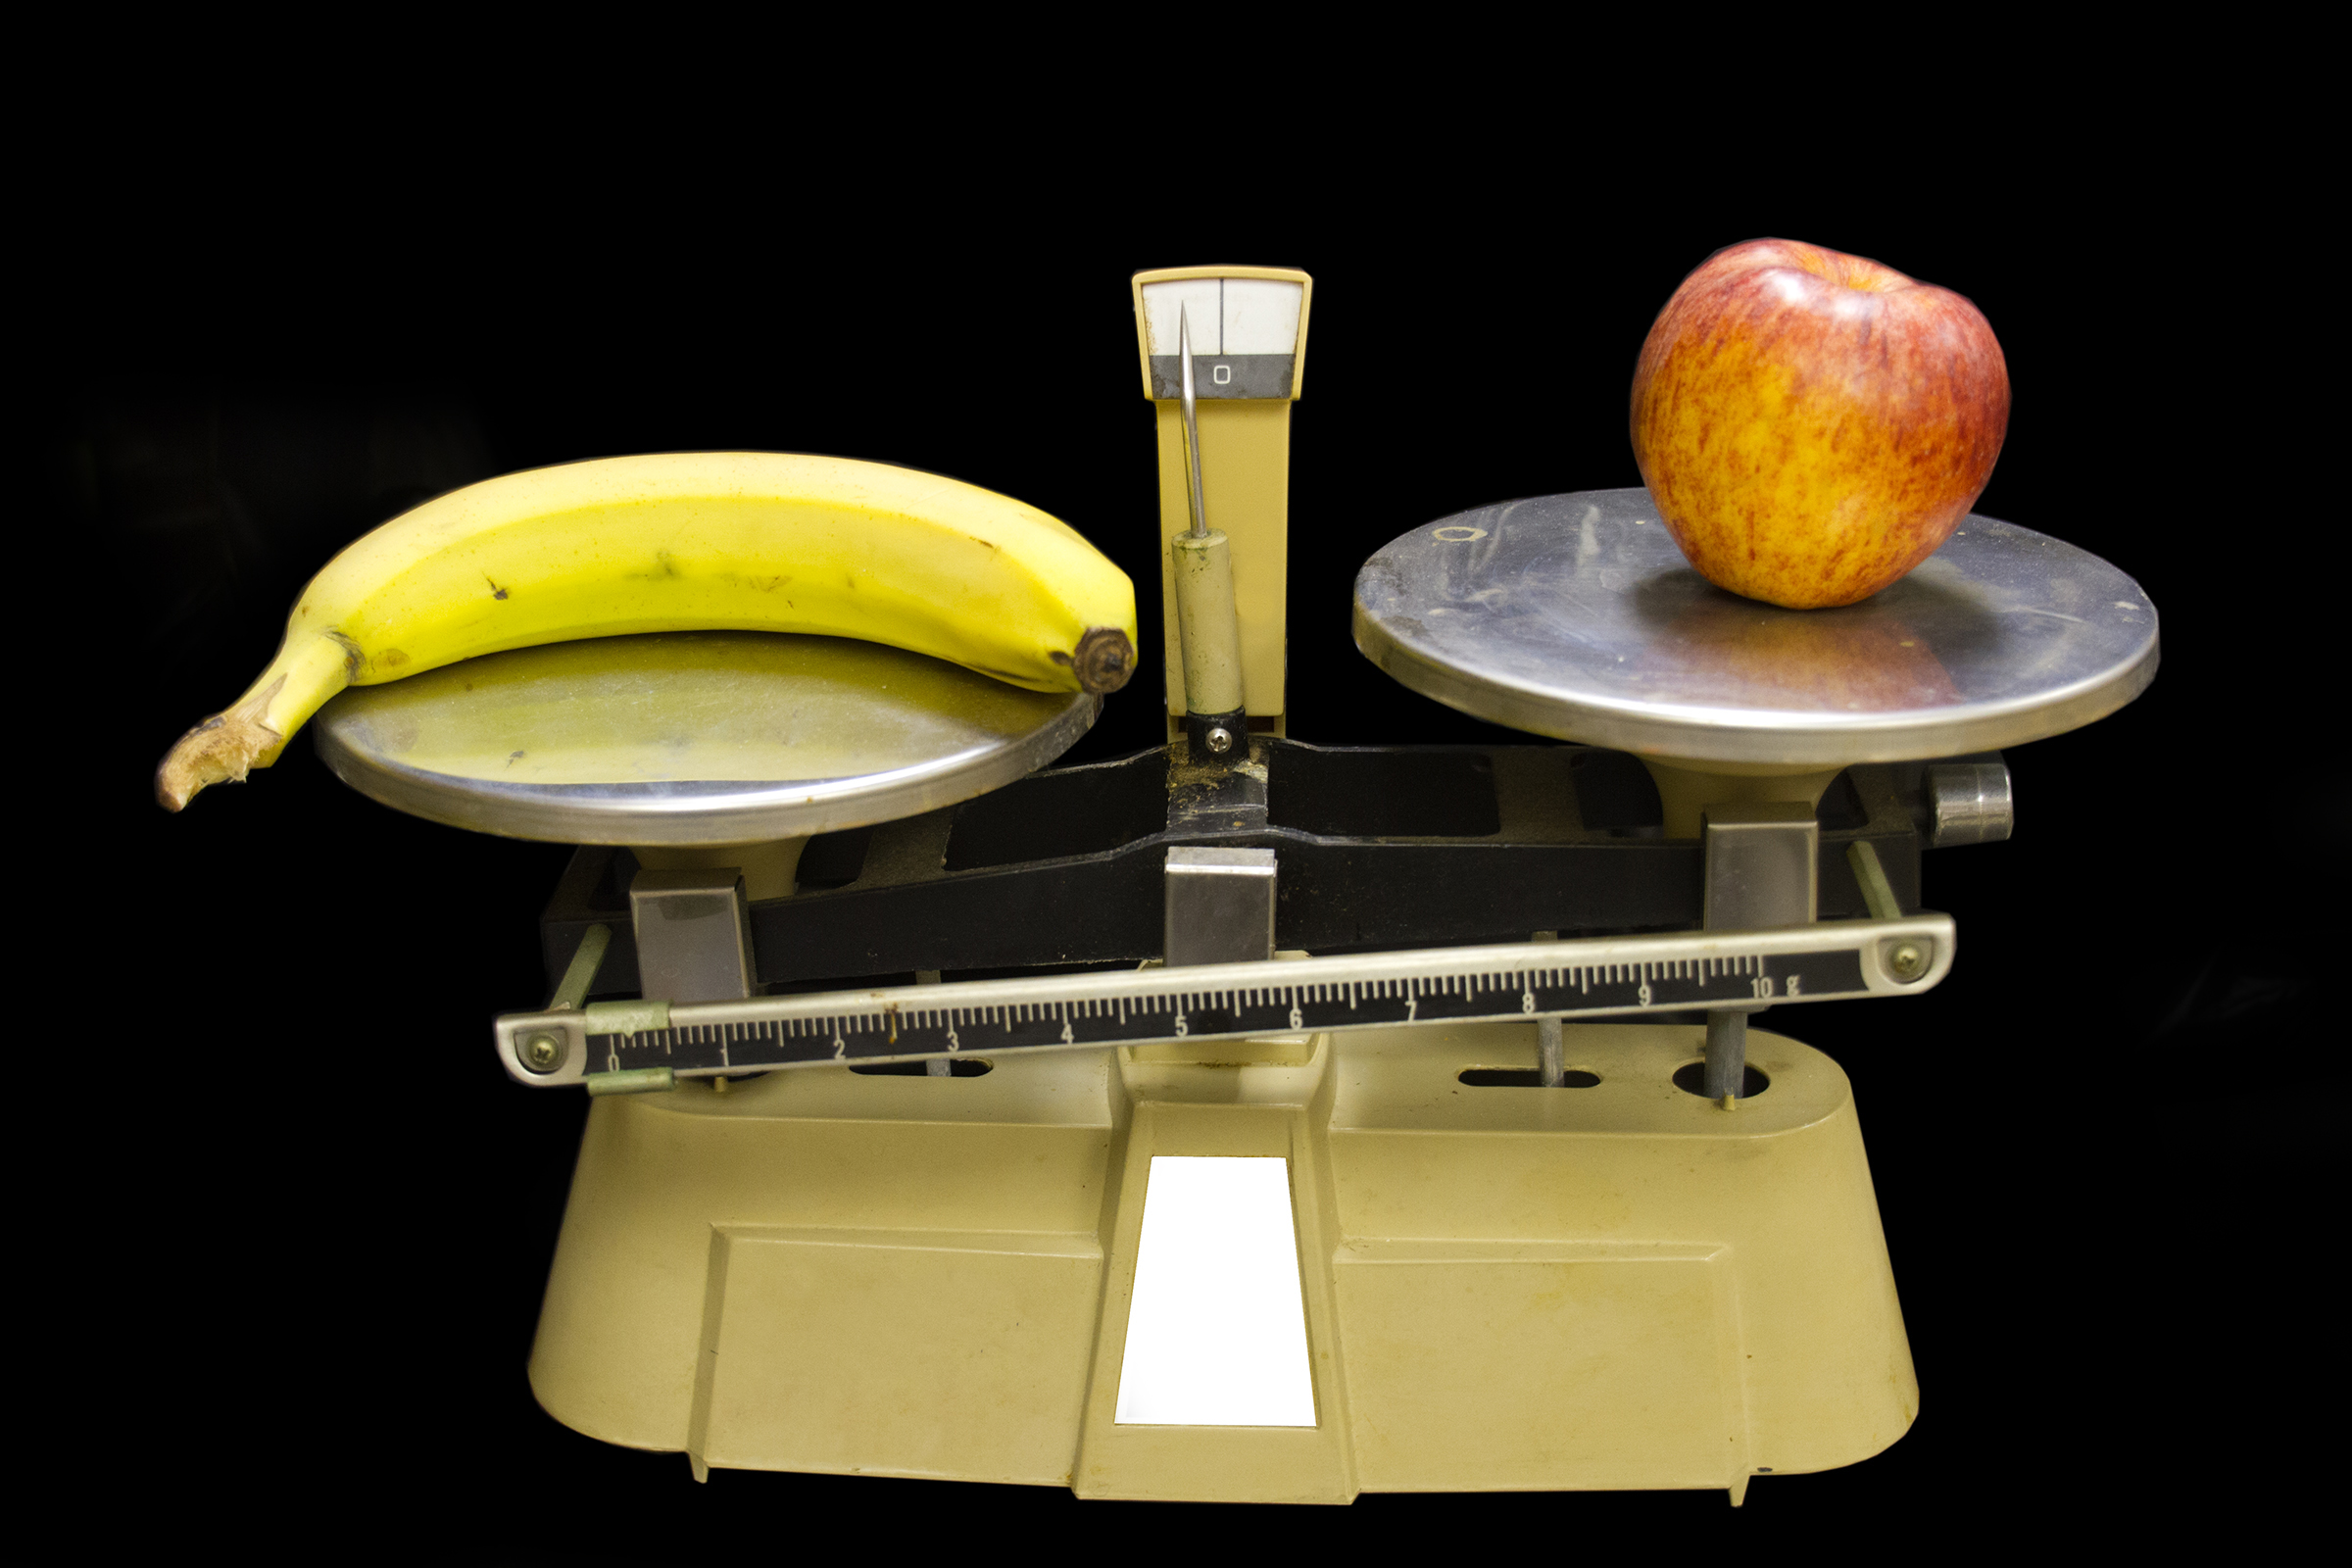 Bilancia calorie